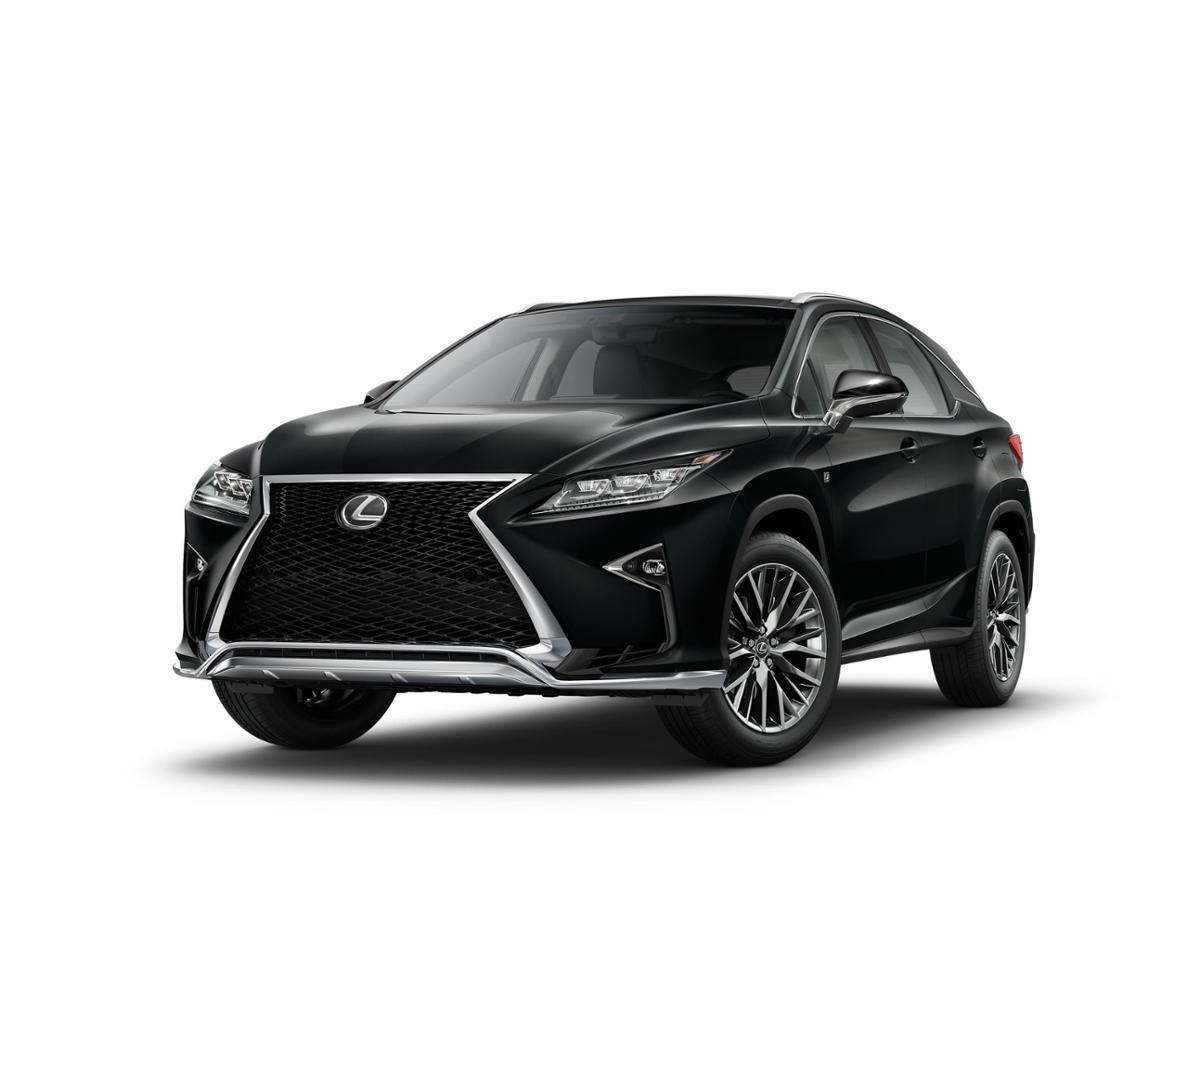 2019 Lexus RX 350 Vehicle Photo in Dallas, TX 75209